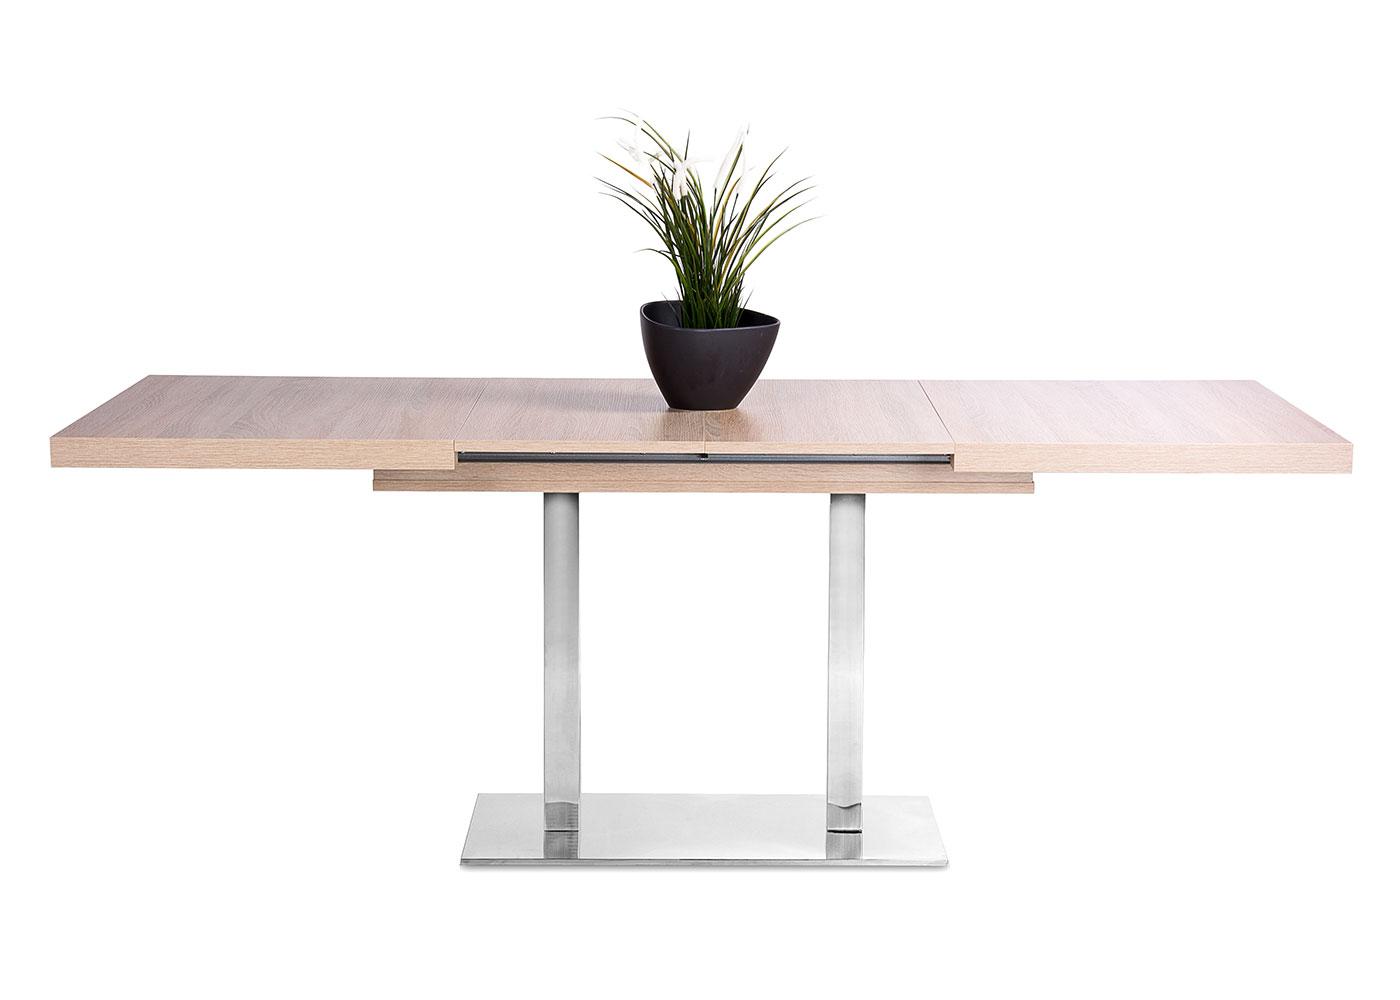 Jídelní stůl rozkládací August, 200 cm, dub